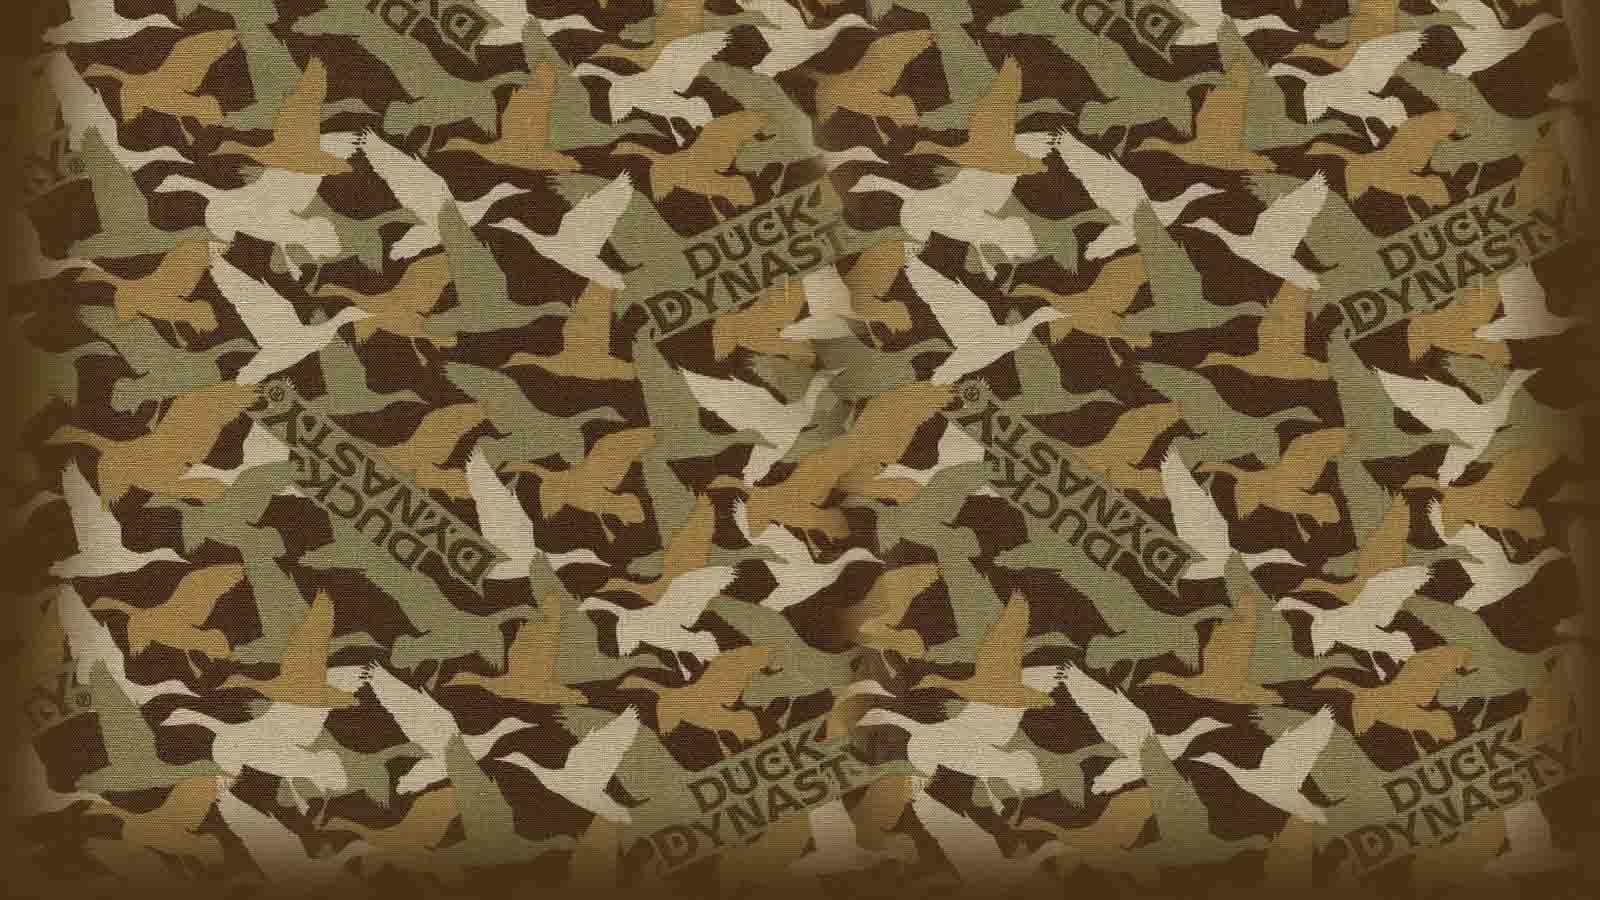 Camo Wallpaper For Computer Shareware Realtree Camo Wallpapers 1920 1080 Hunting Camouflage Wallpa Camouflage Wallpaper Realtree Camo Wallpaper Camo Wallpaper